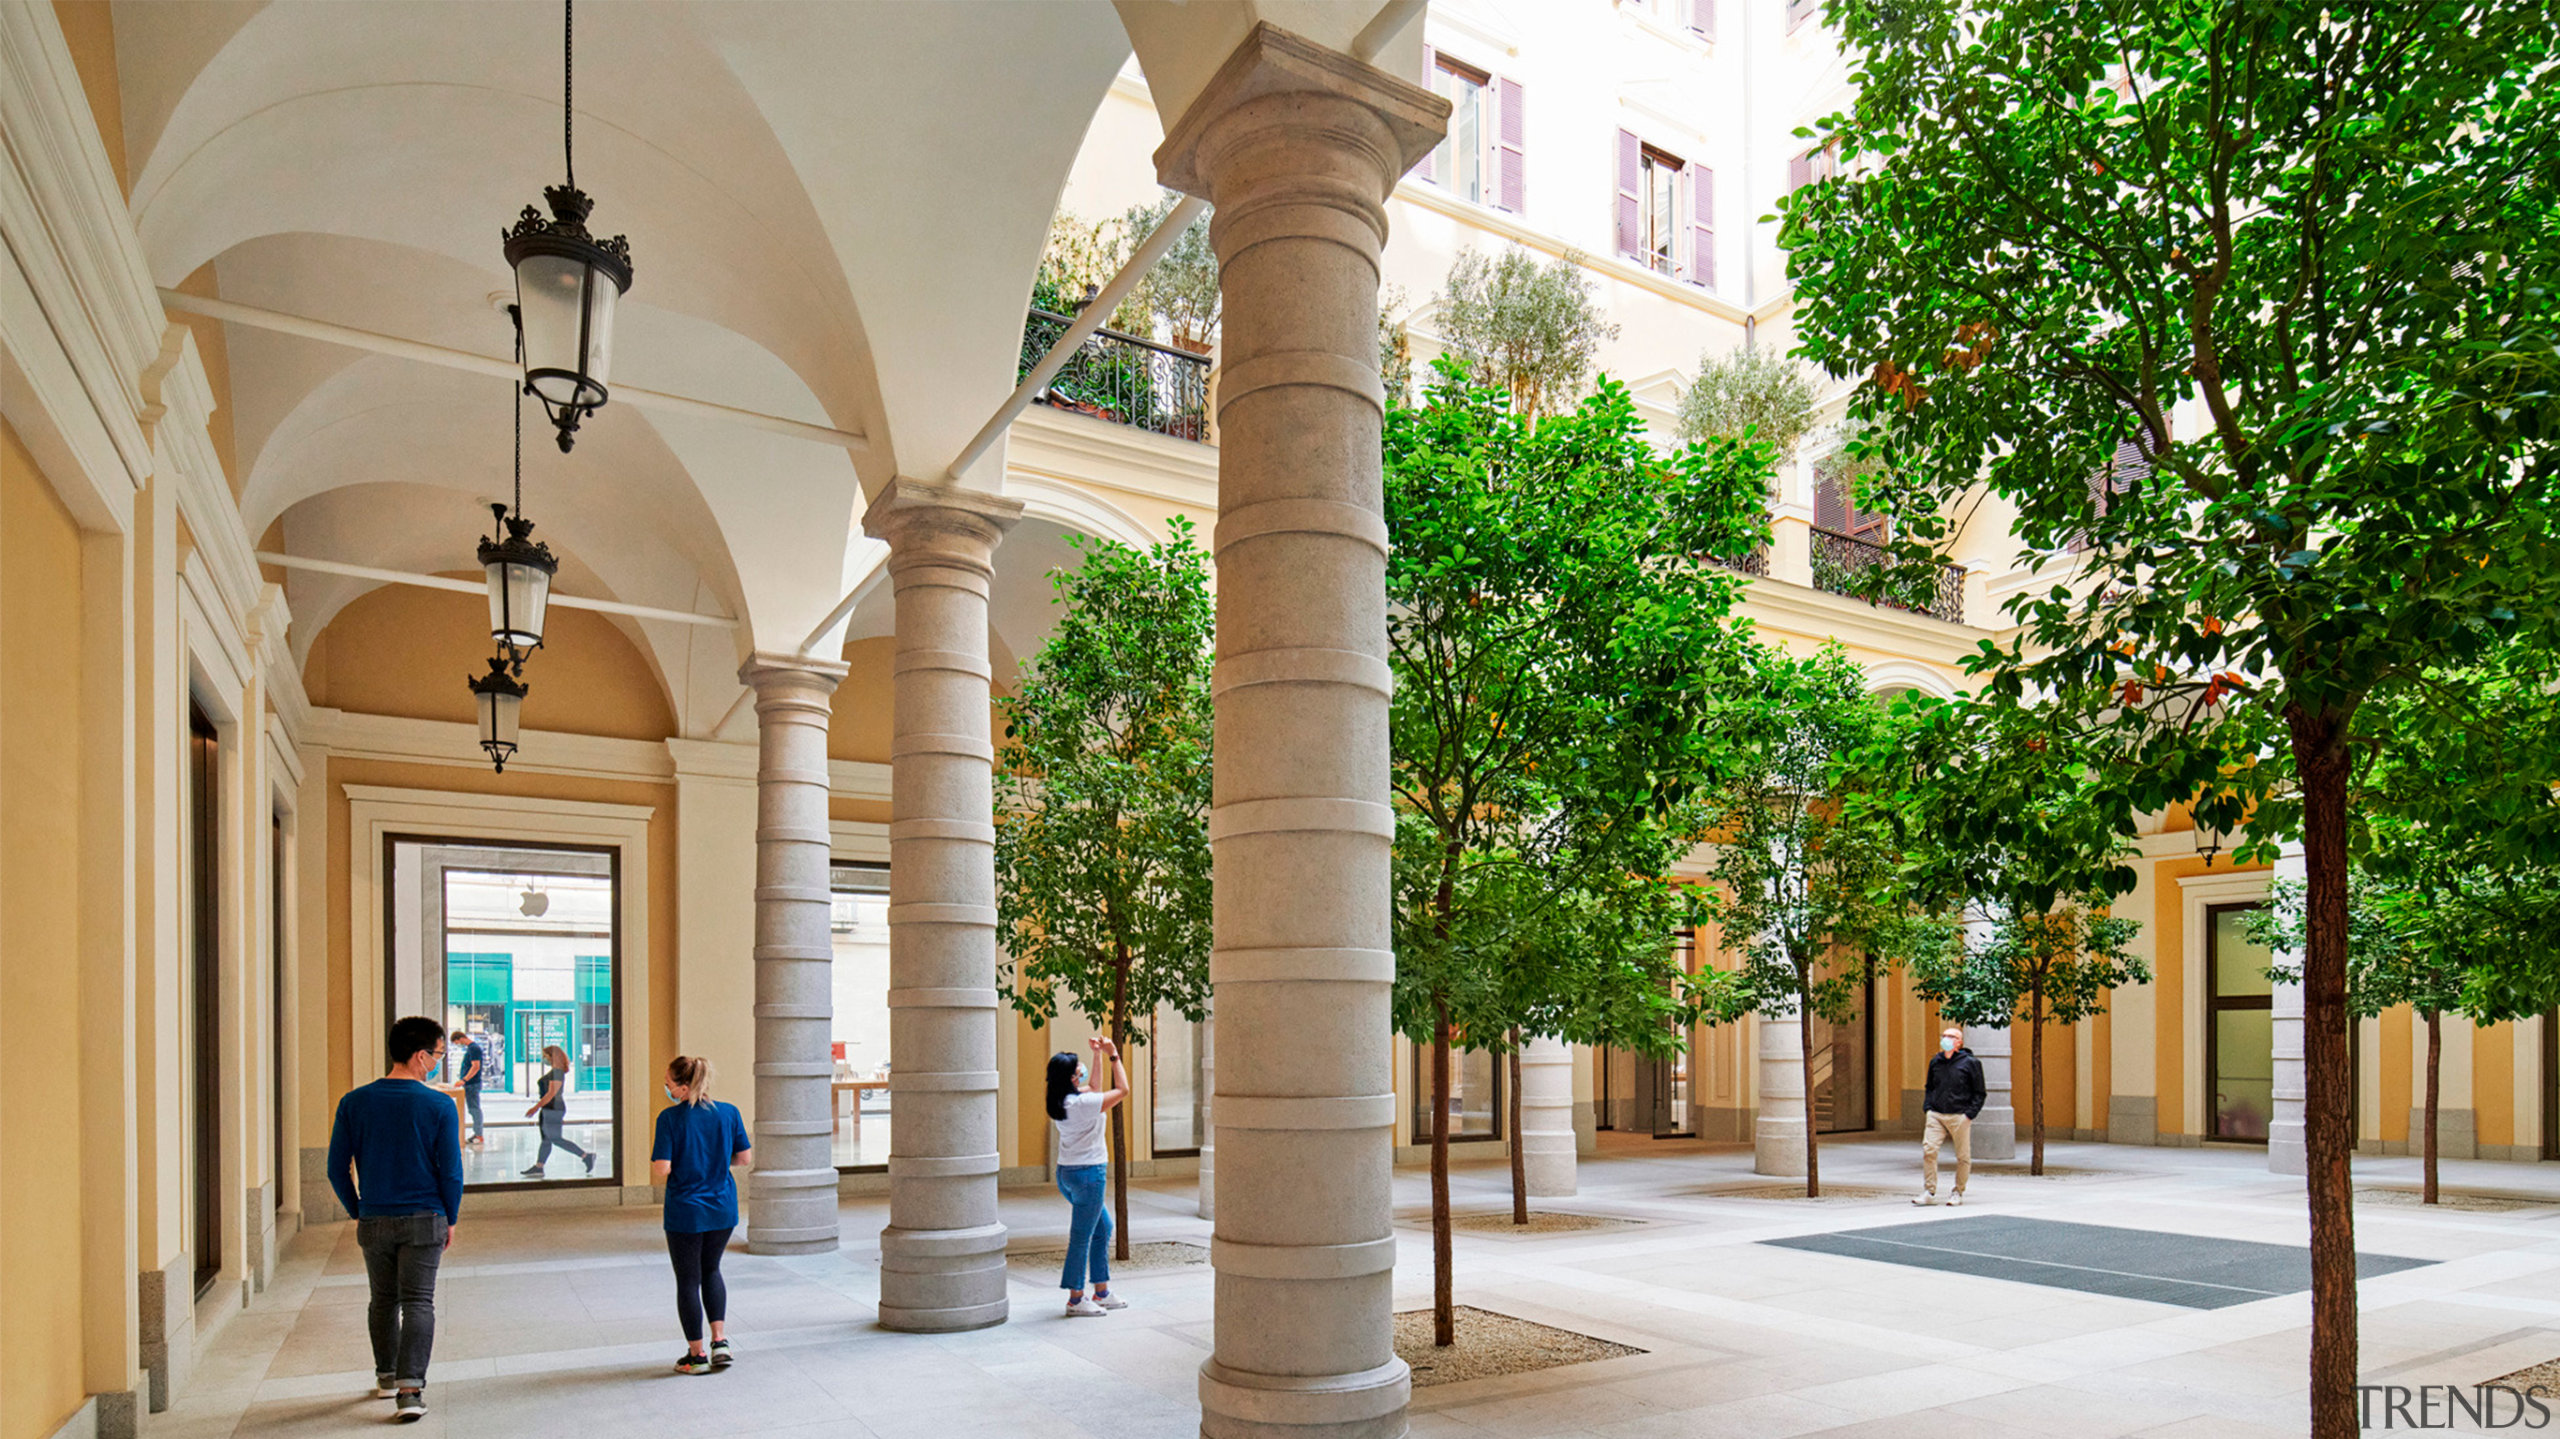 The popular historic Palazzo Marignoli – Apple's new